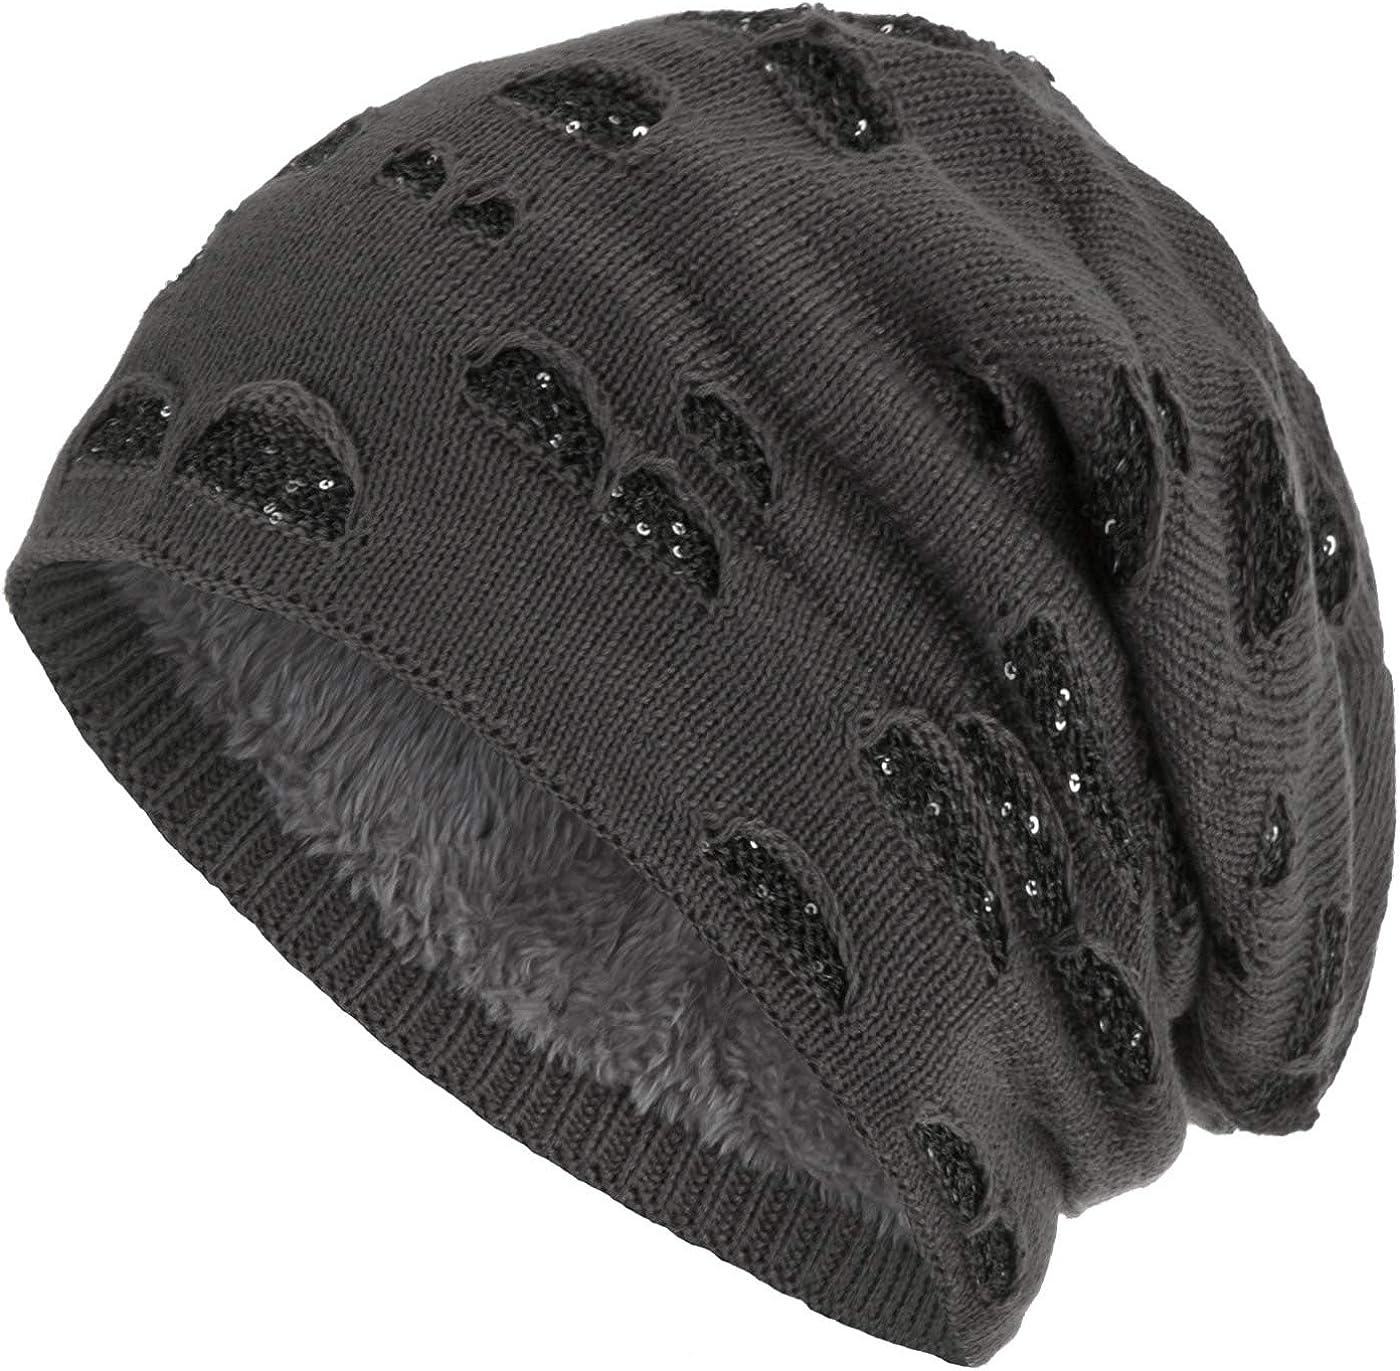 Compagno Beanie Gorro de invierno con suave interior punto agujero elegante con lentejuelas